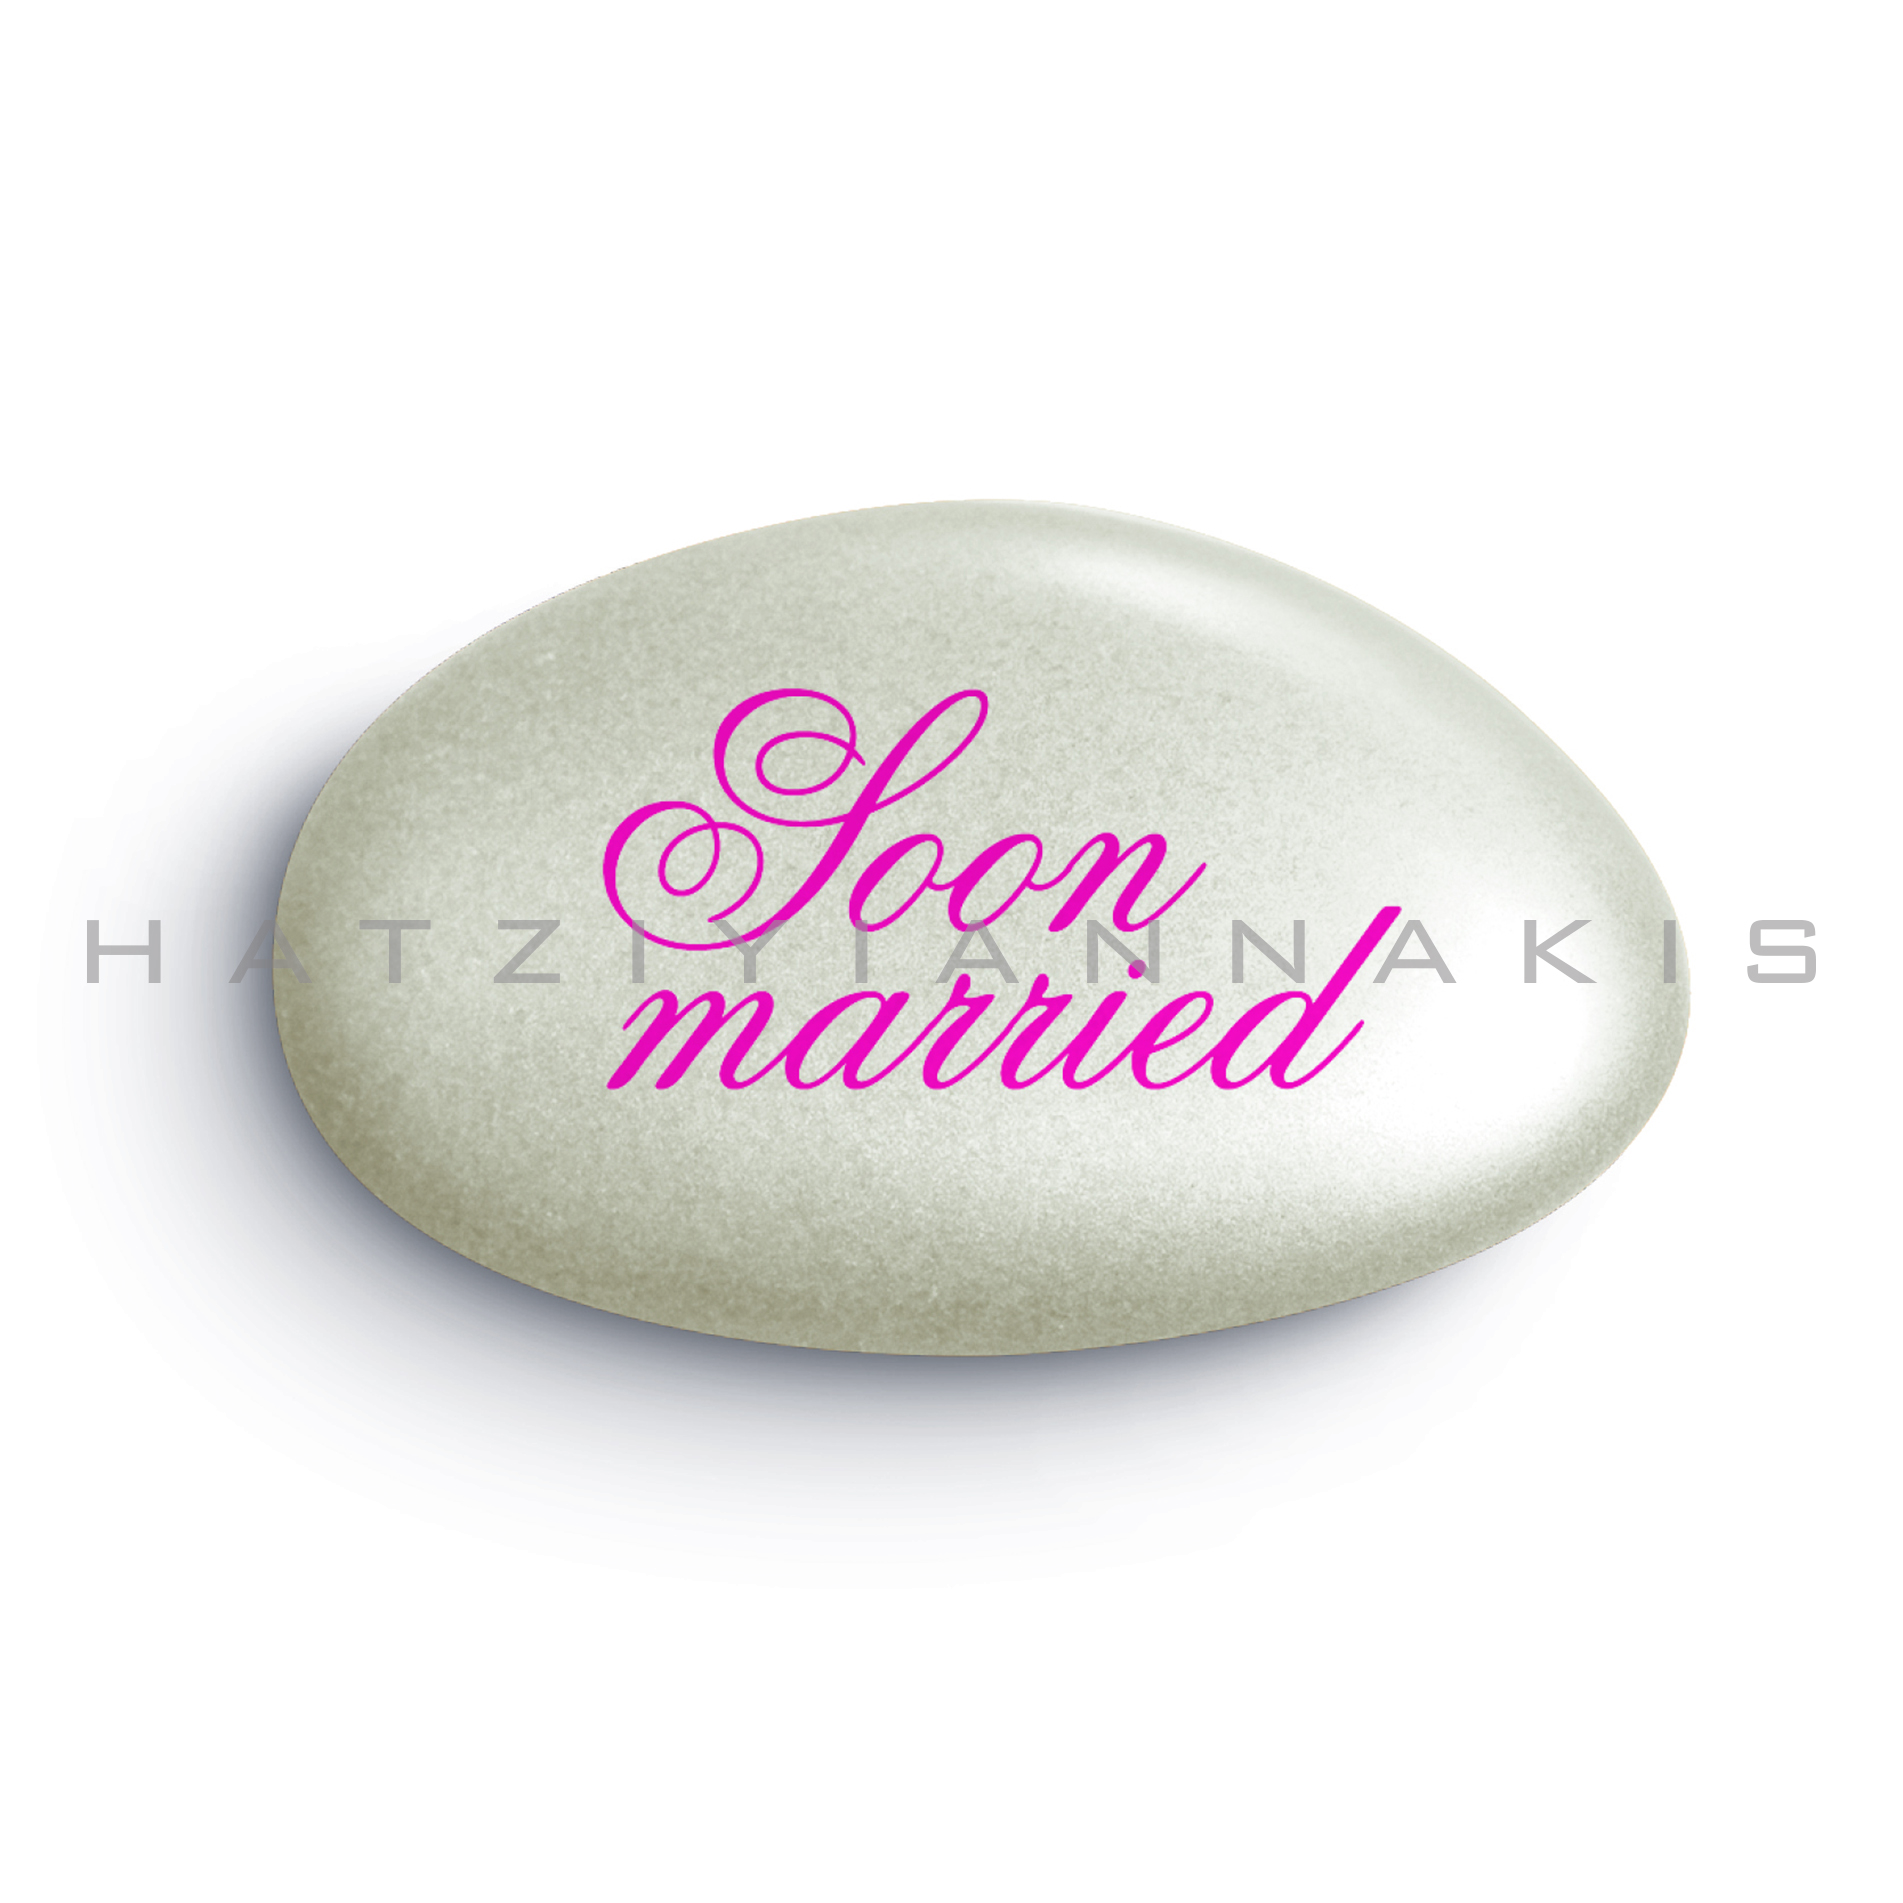 3004. Soon married